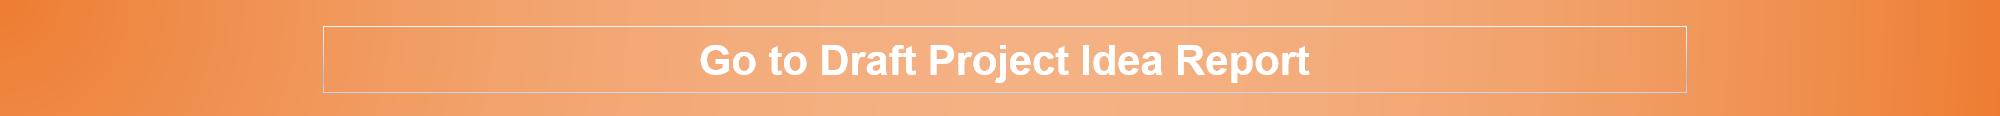 Draft Project Idea Report